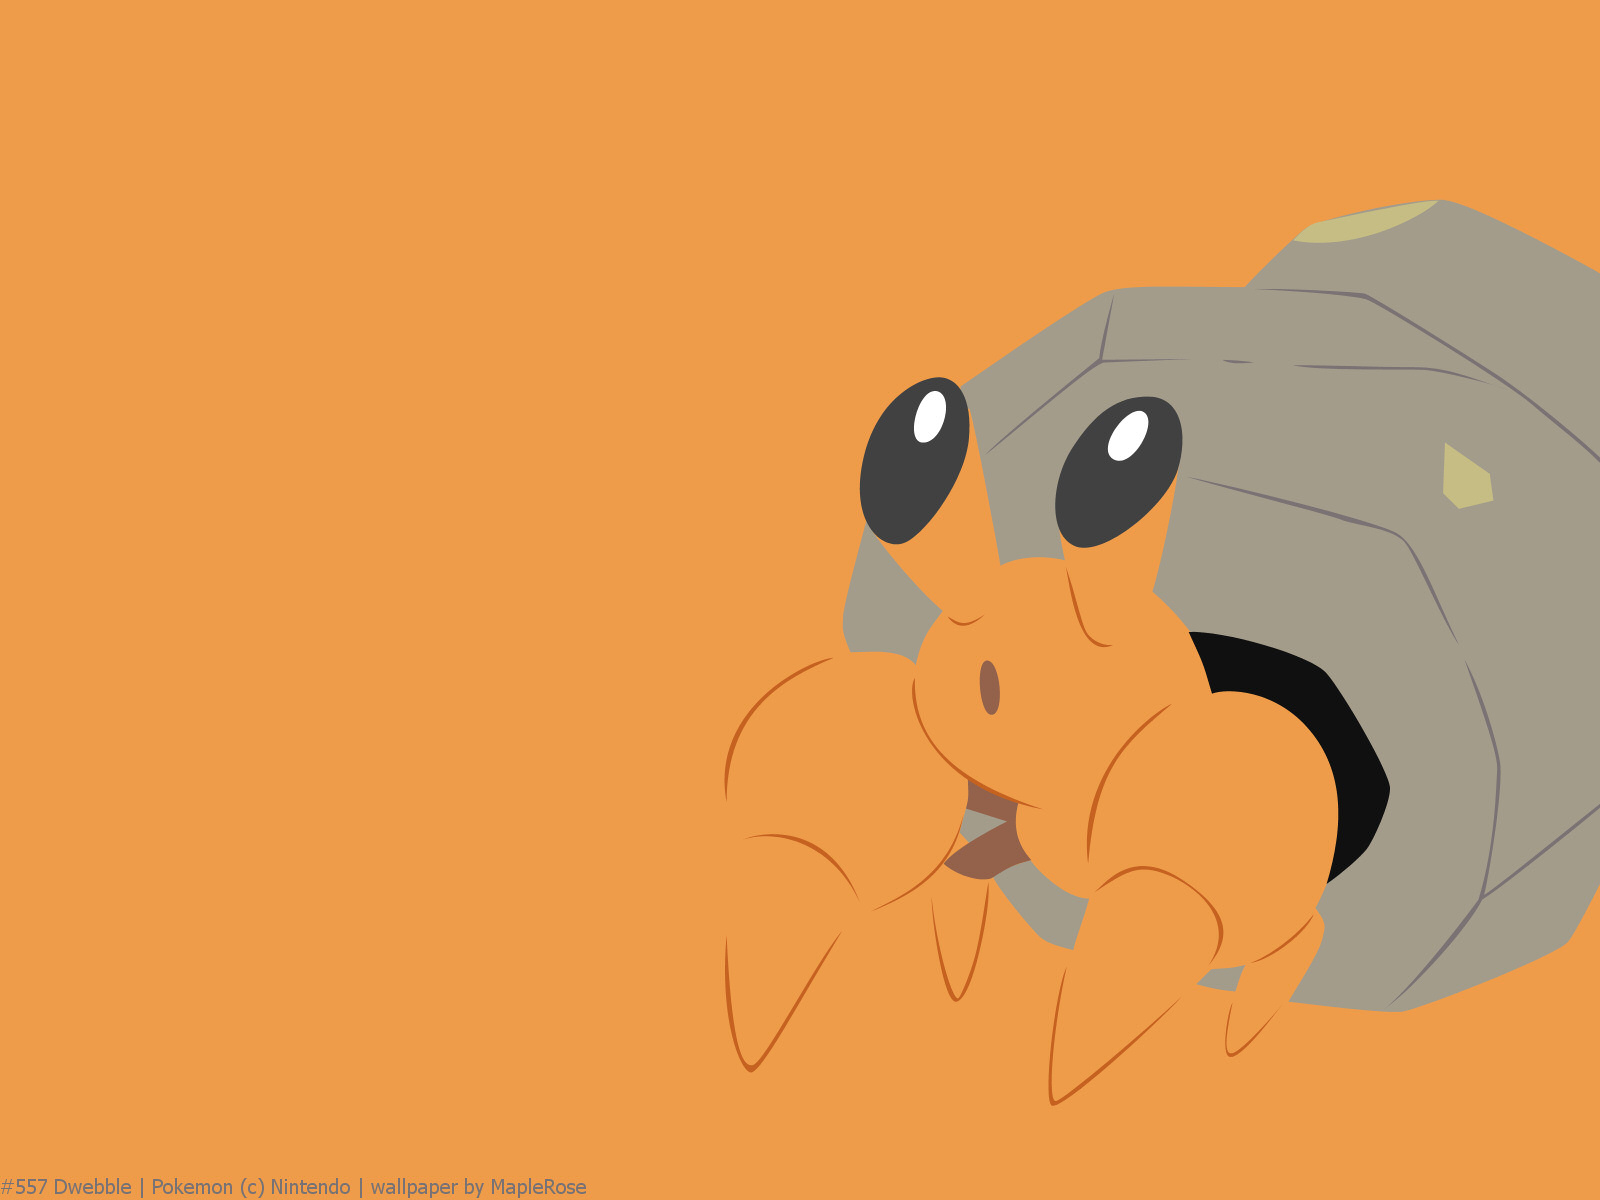 Pokemon Dwebble Evolution Images | Pokemon Images